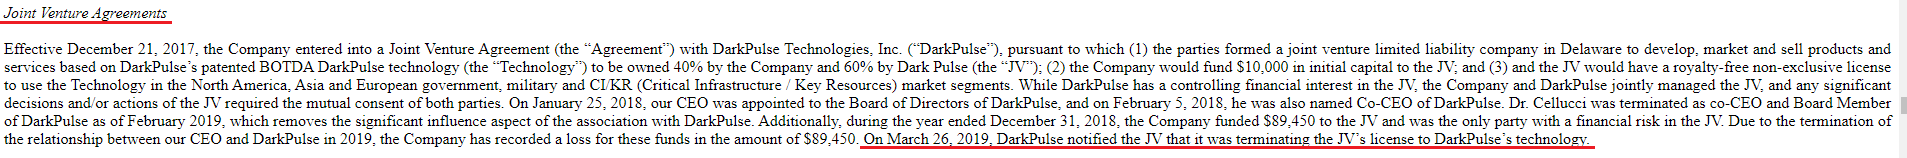 DarkPulse Technologies Terminates Agreement